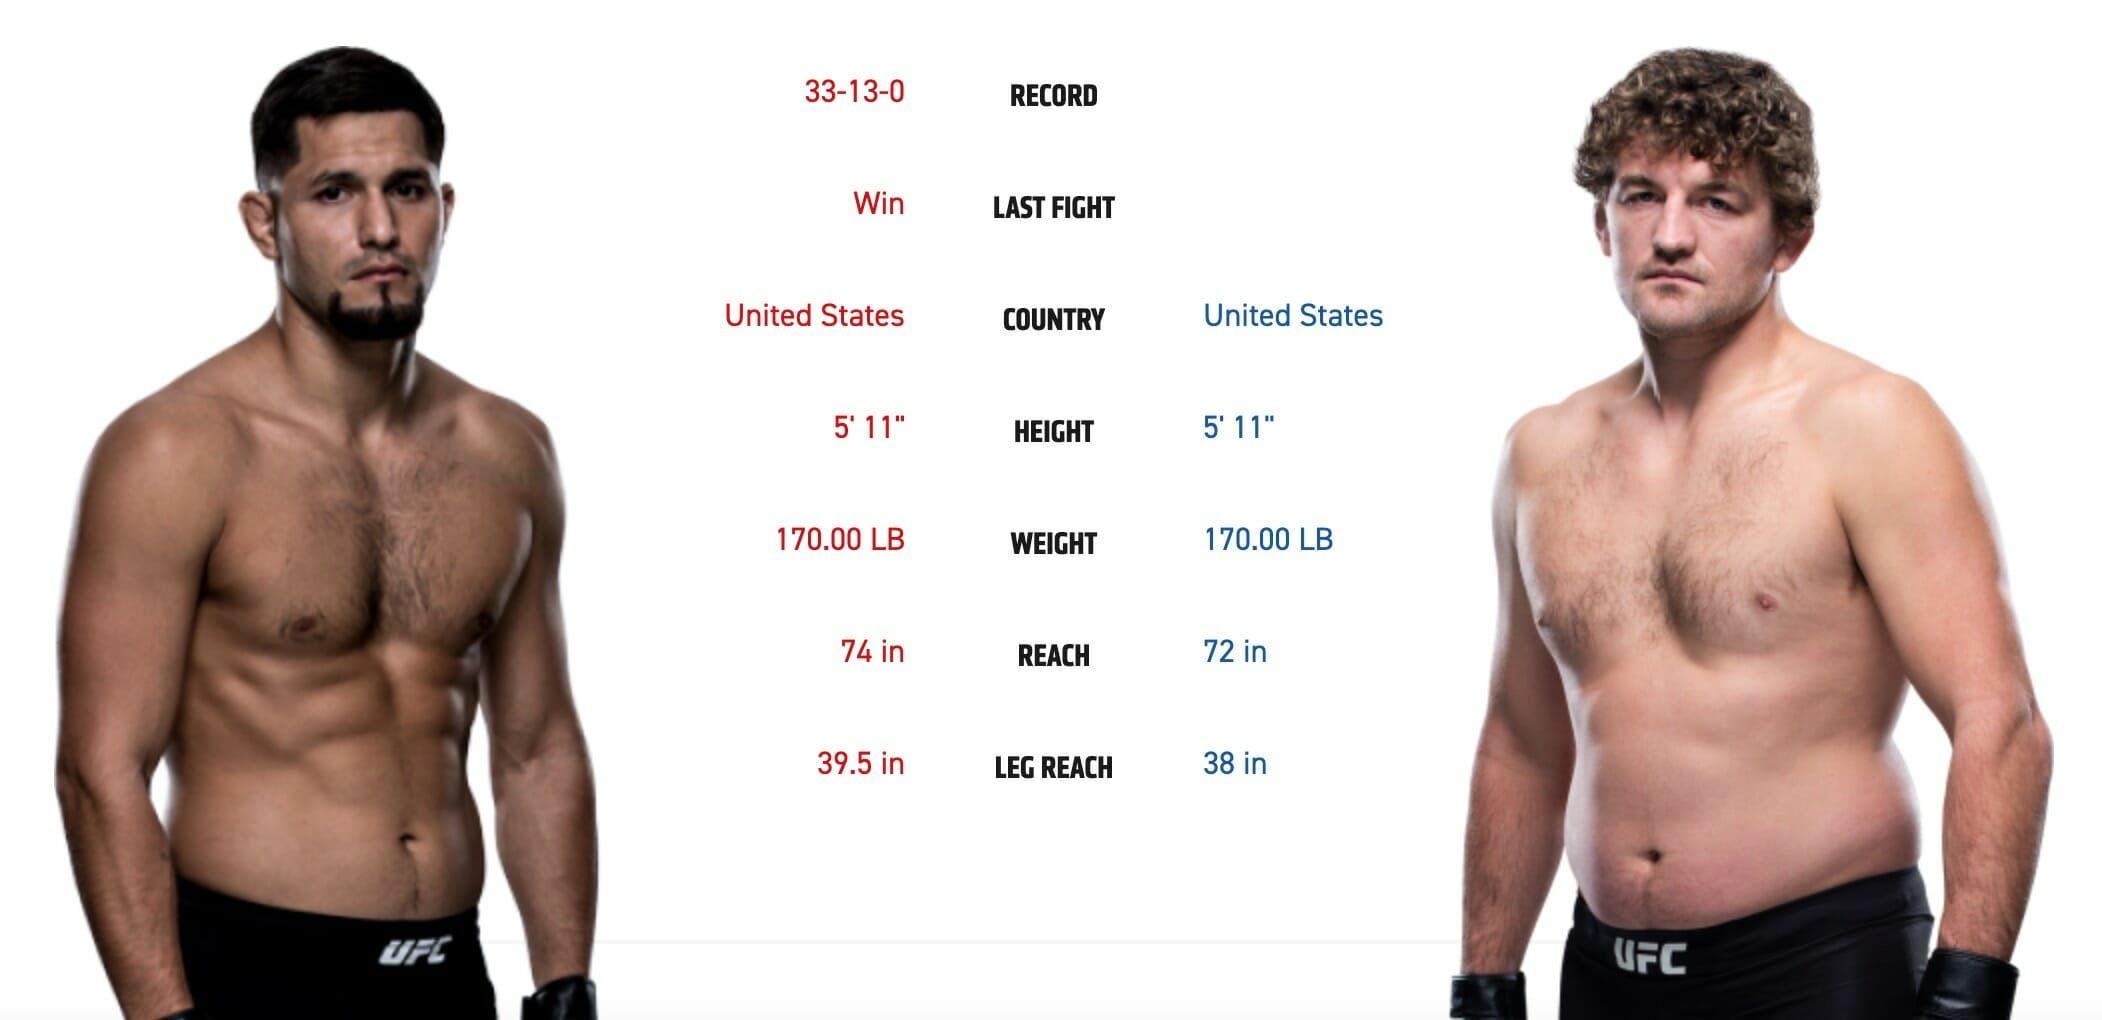 UFC 239 Jorge Masvidal vs. Ben Askren